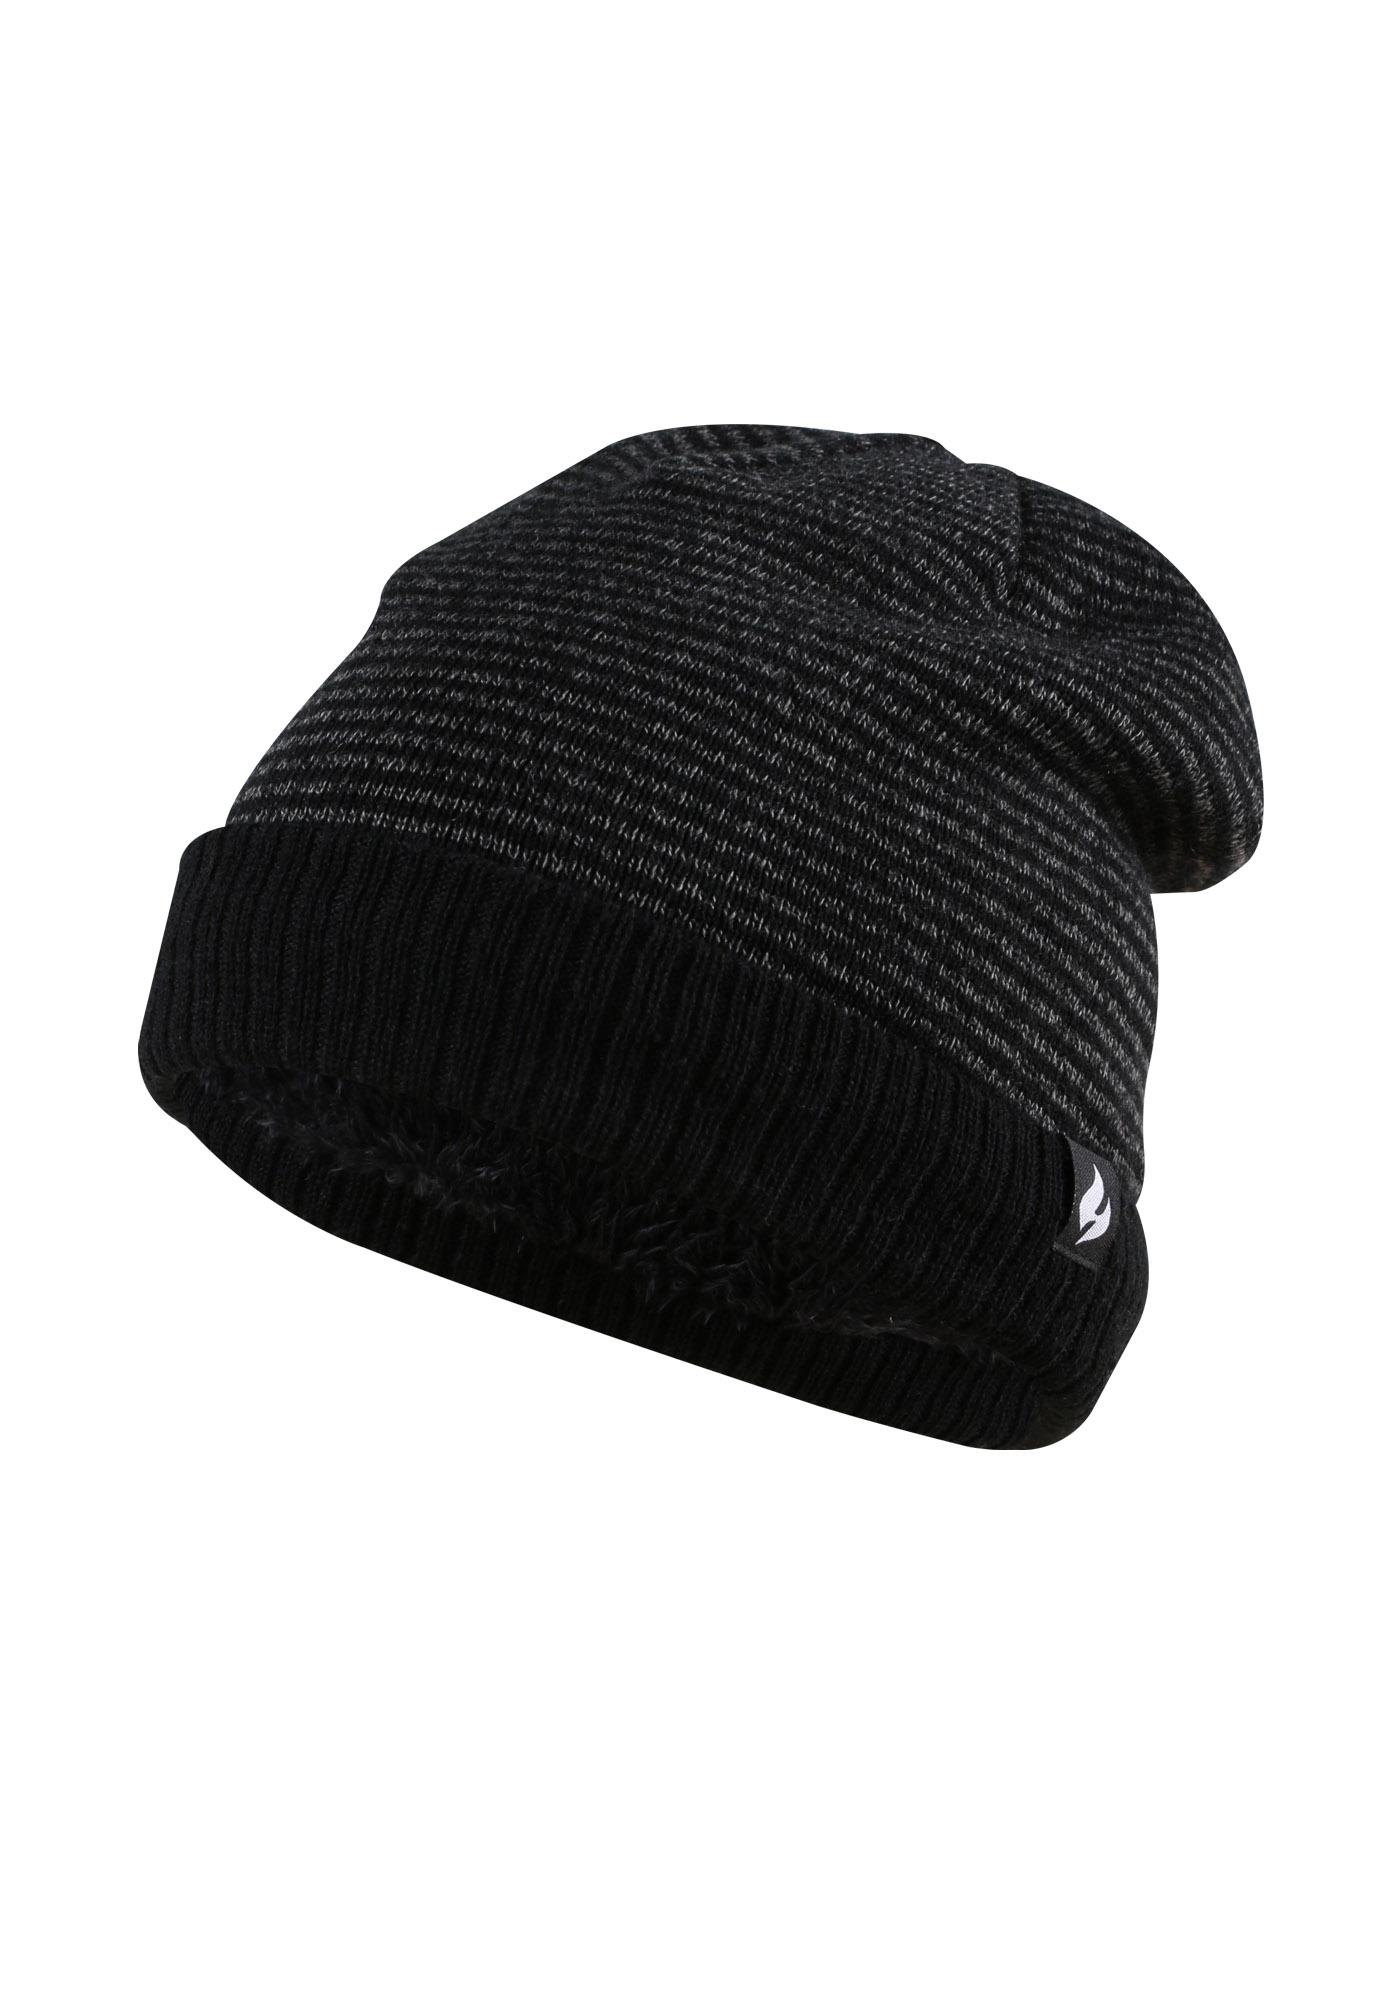 53295425ebf Men s Thermal Hat